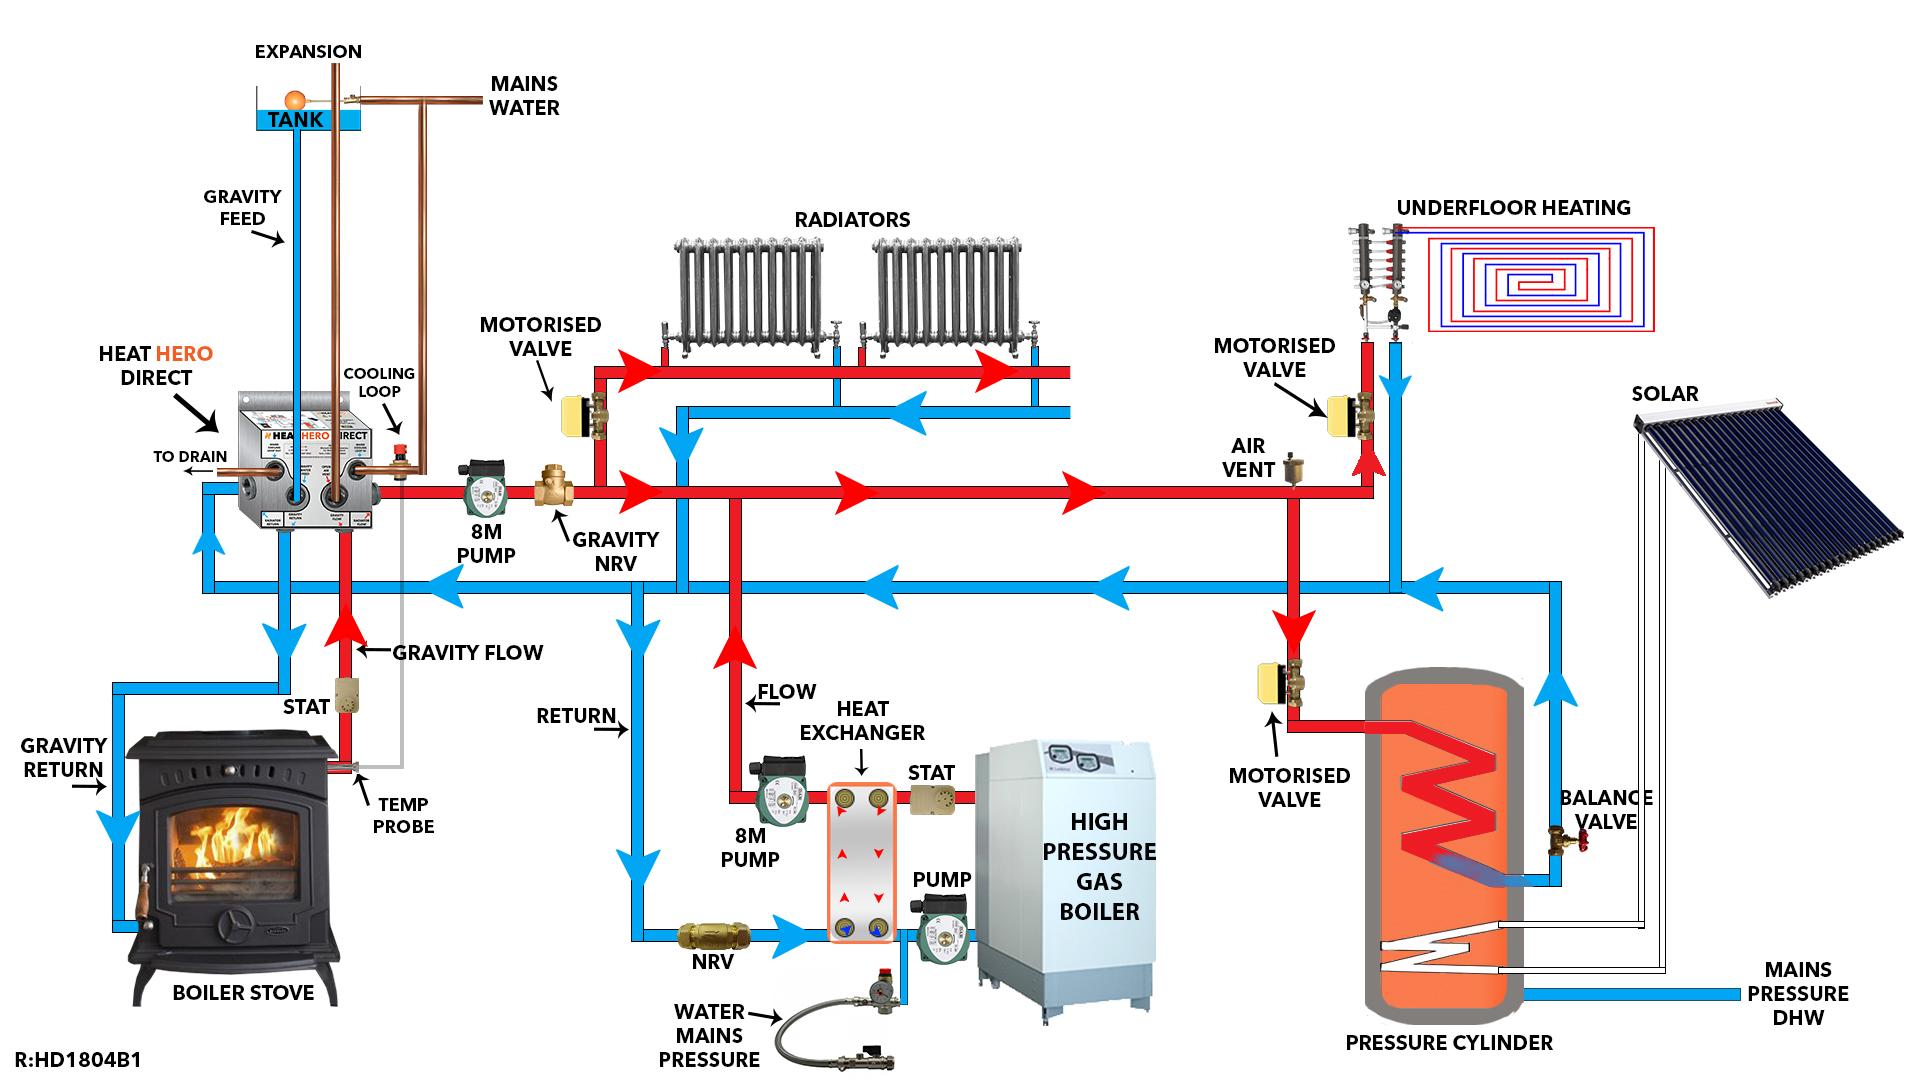 Heat Hero Direct Technical